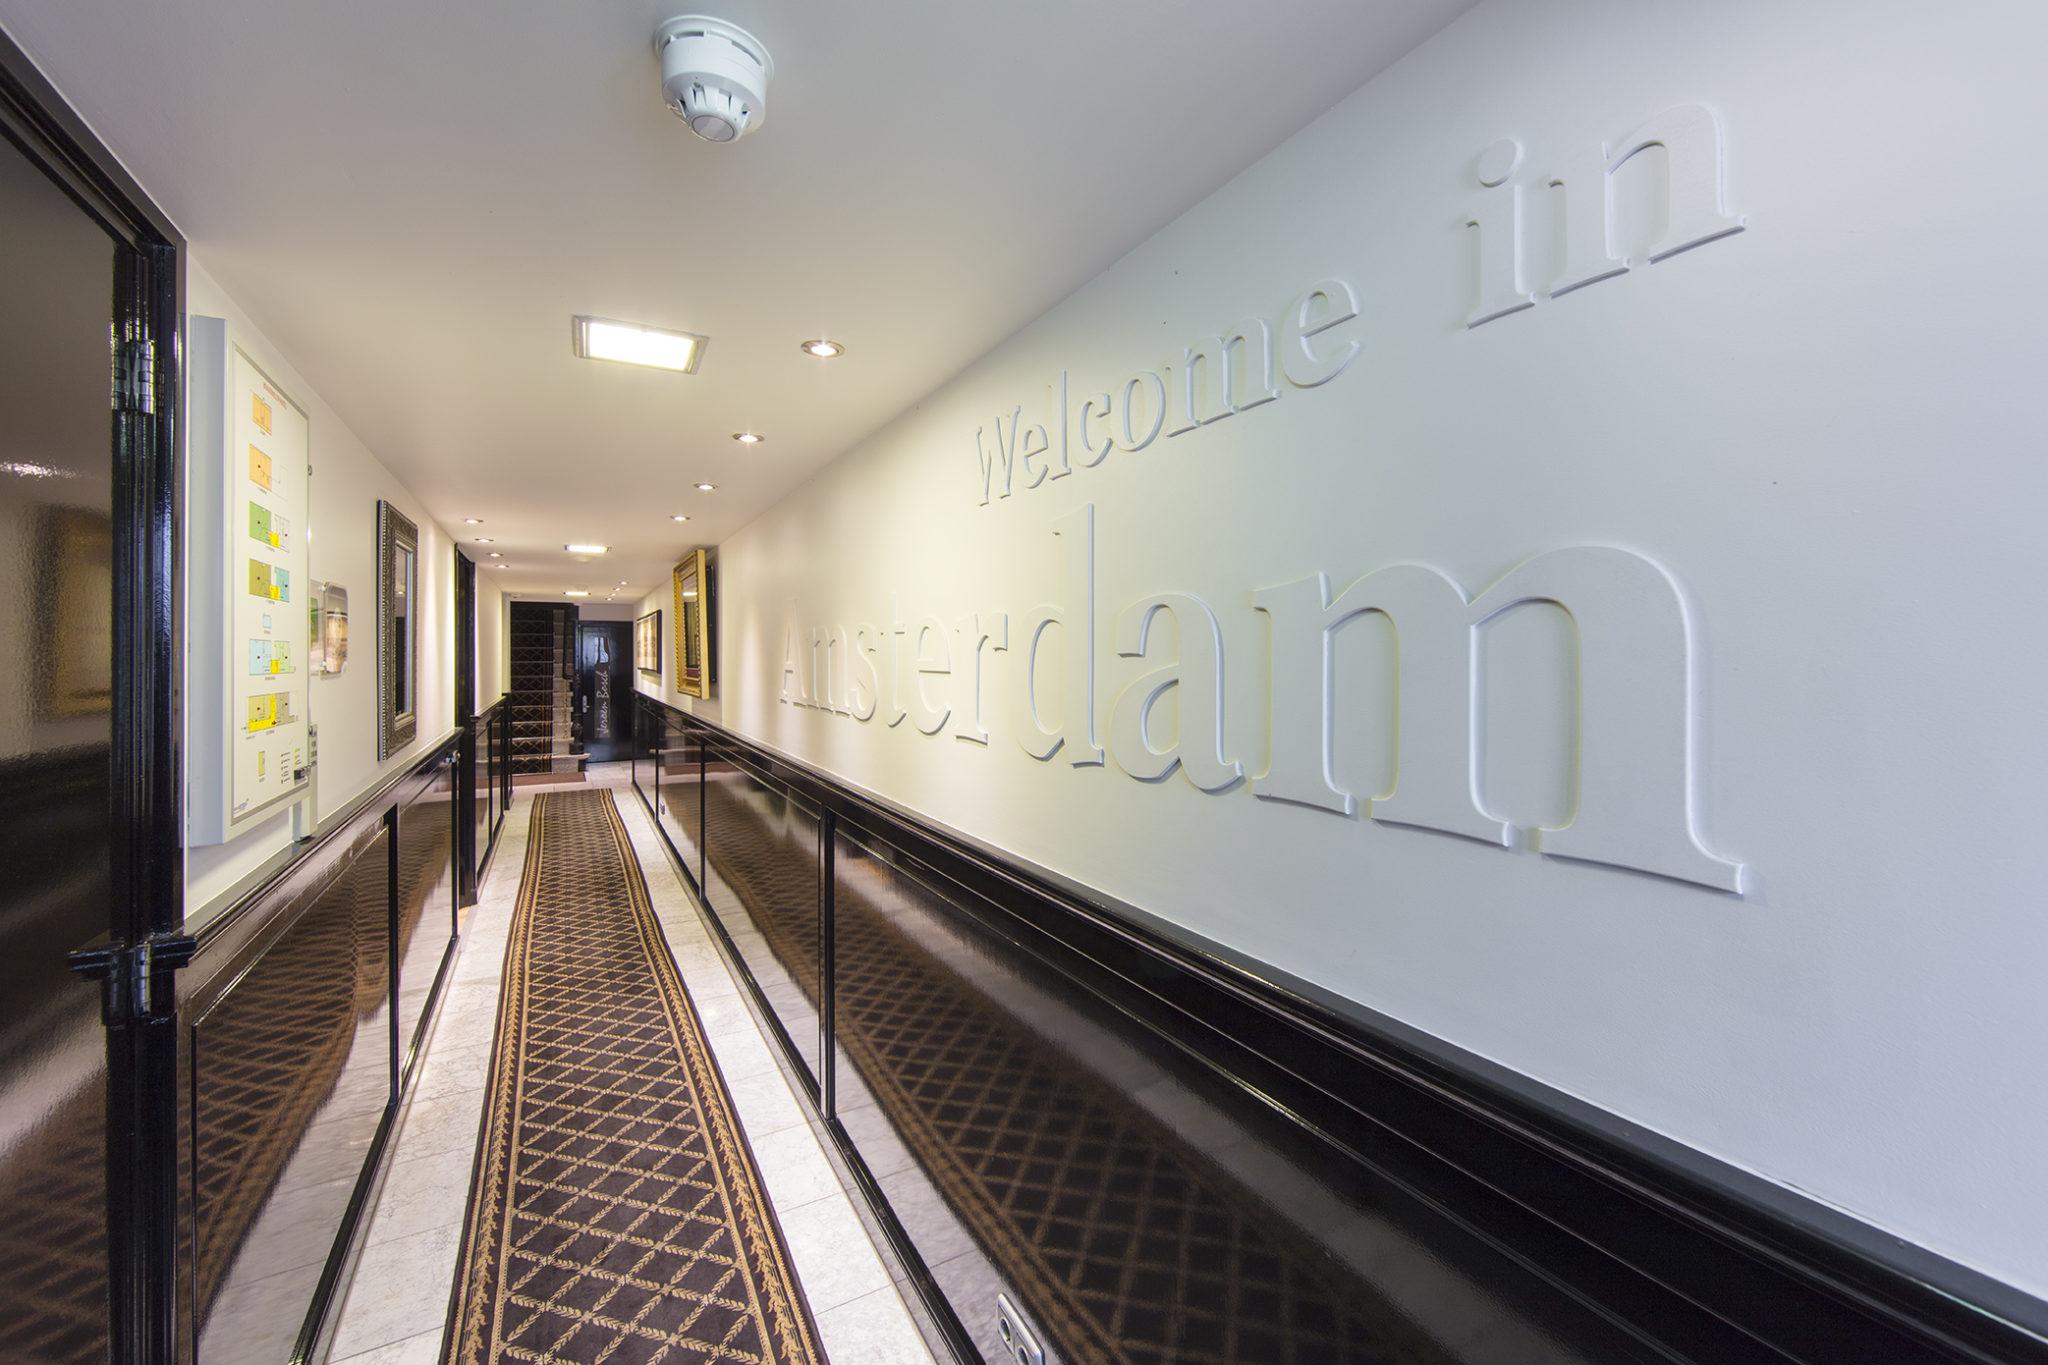 Dutch Masters Amsterdam Entrance © Michael van Oosten